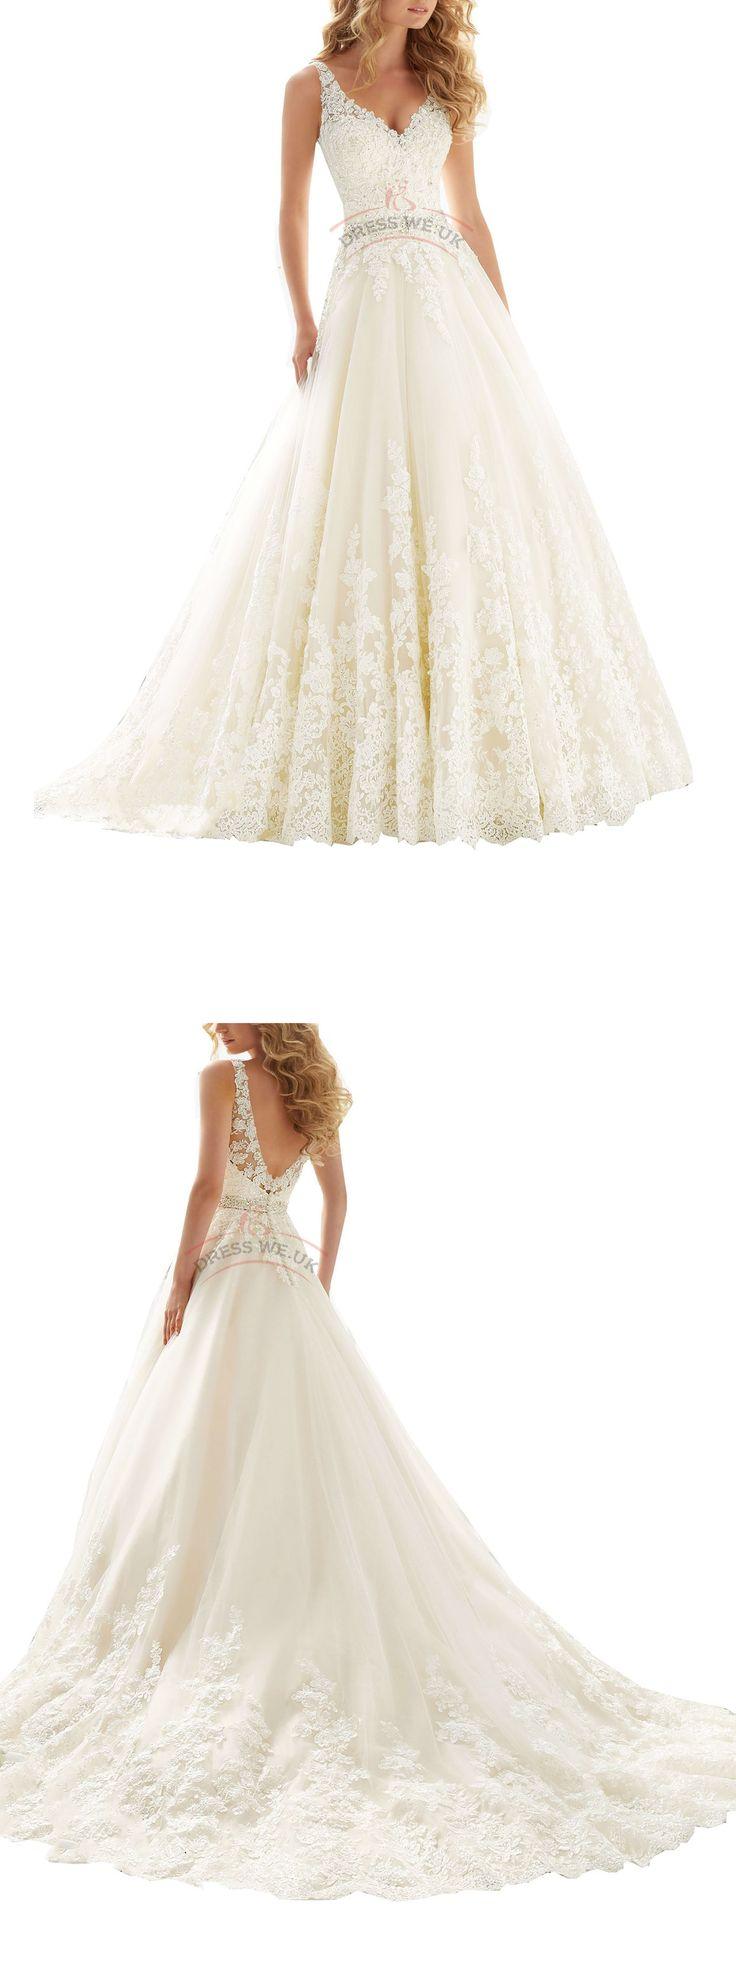 Largos Pretty Double V-Neck Wedding Dresses,Lace Applique Wedding Dresses,Corset Wedding Dresses,Empire Chapel Train Wedding Dresses - 2016